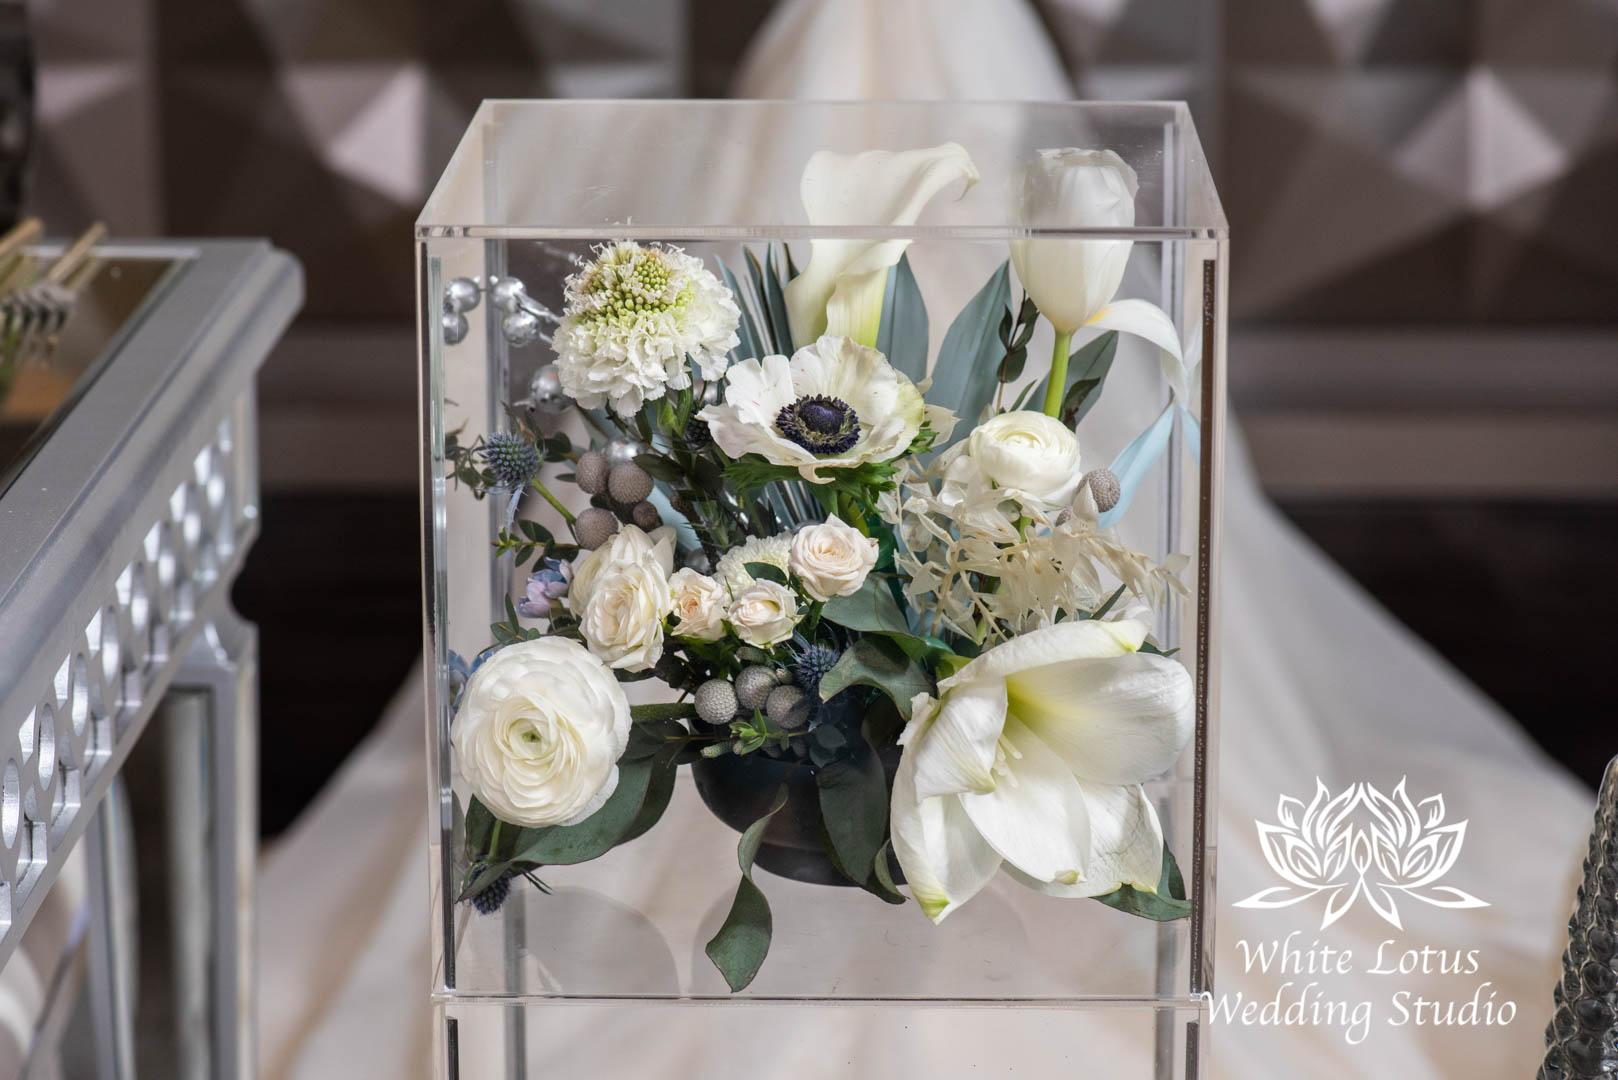 119- GLAM WINTERLUXE WEDDING INSPIRATION